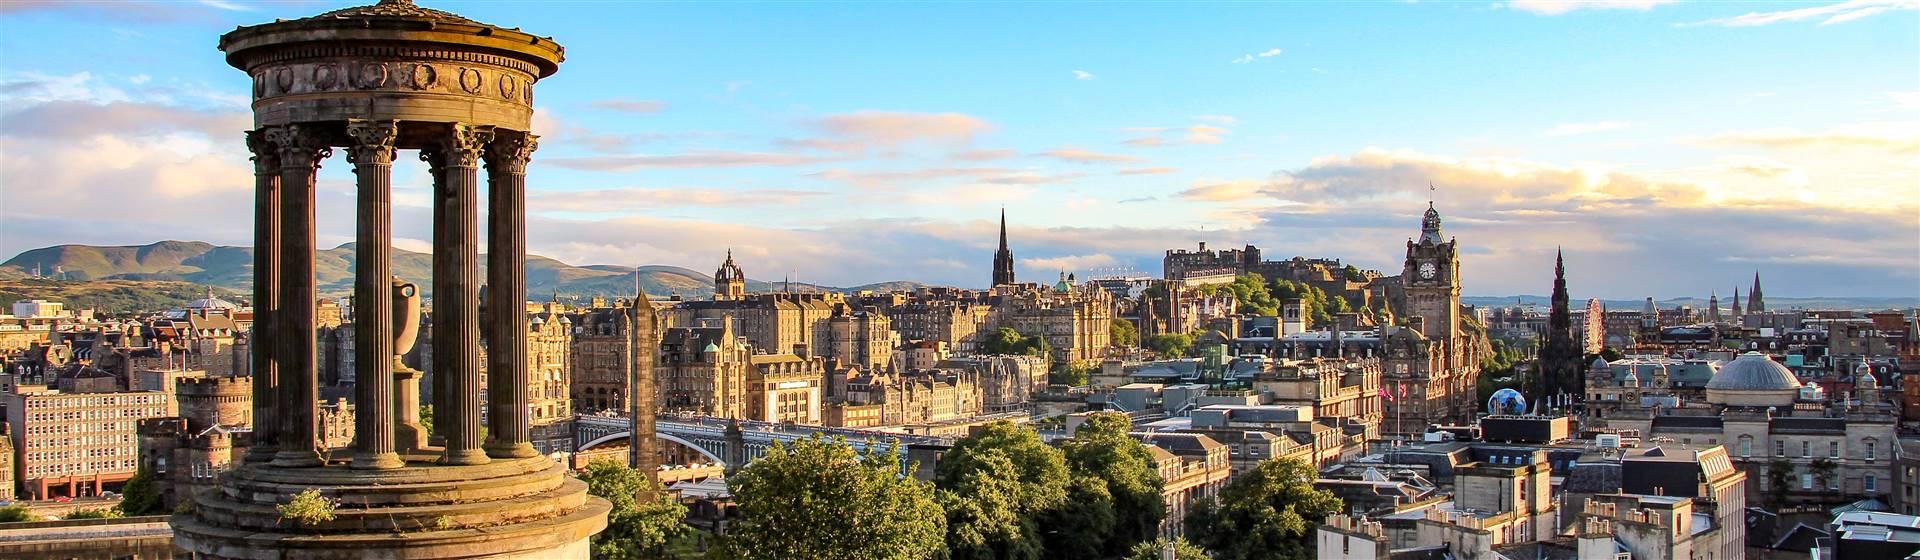 Scottish Borders & Edinburgh